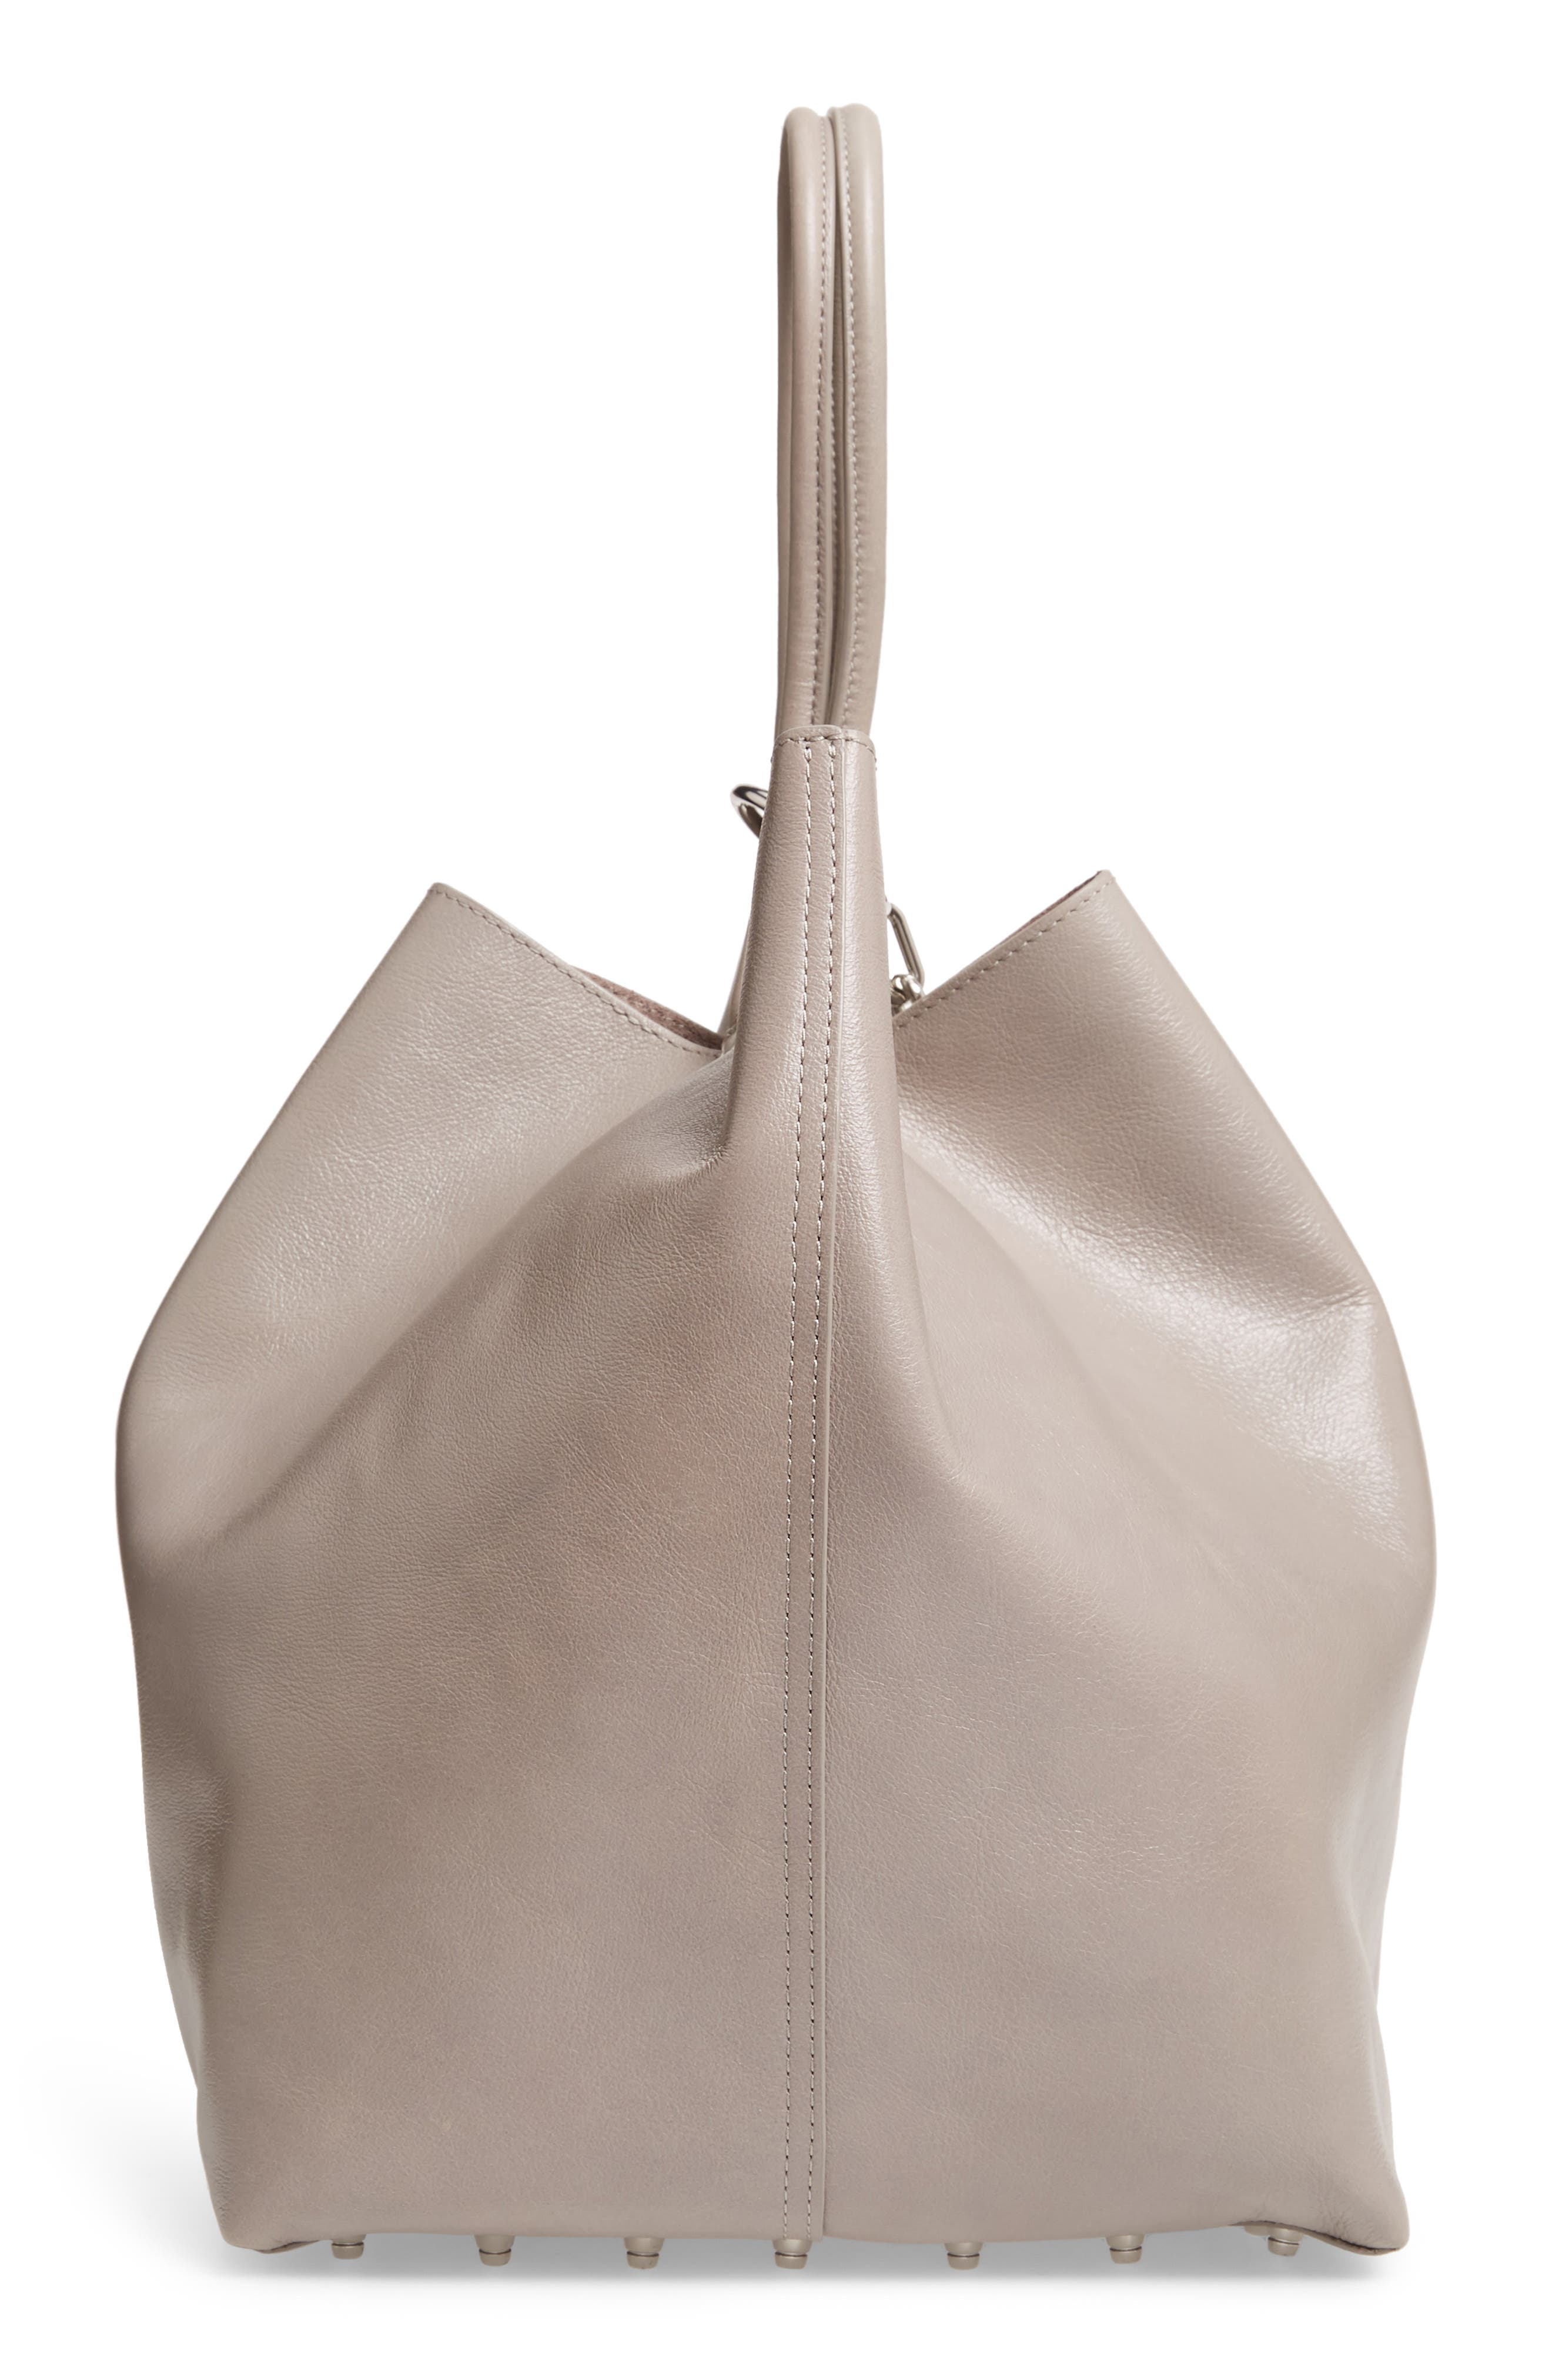 Roxy Large Leather Tote Bag,                             Alternate thumbnail 5, color,                             SLATE